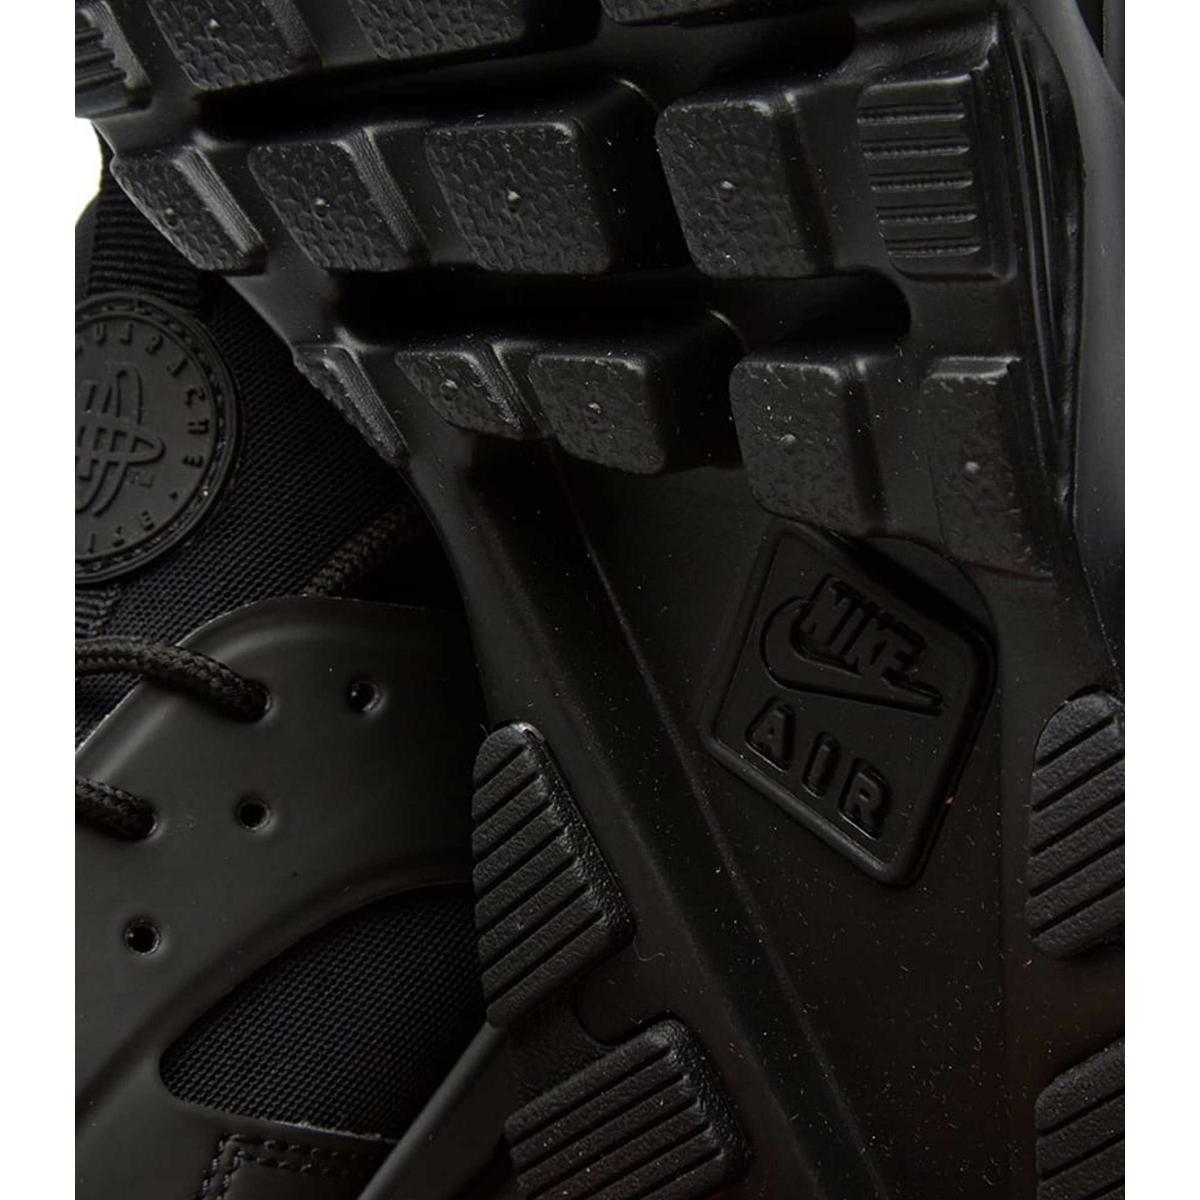 Scarpe Nike Air Huarache Run Ultra Nero Uomo 819685-002